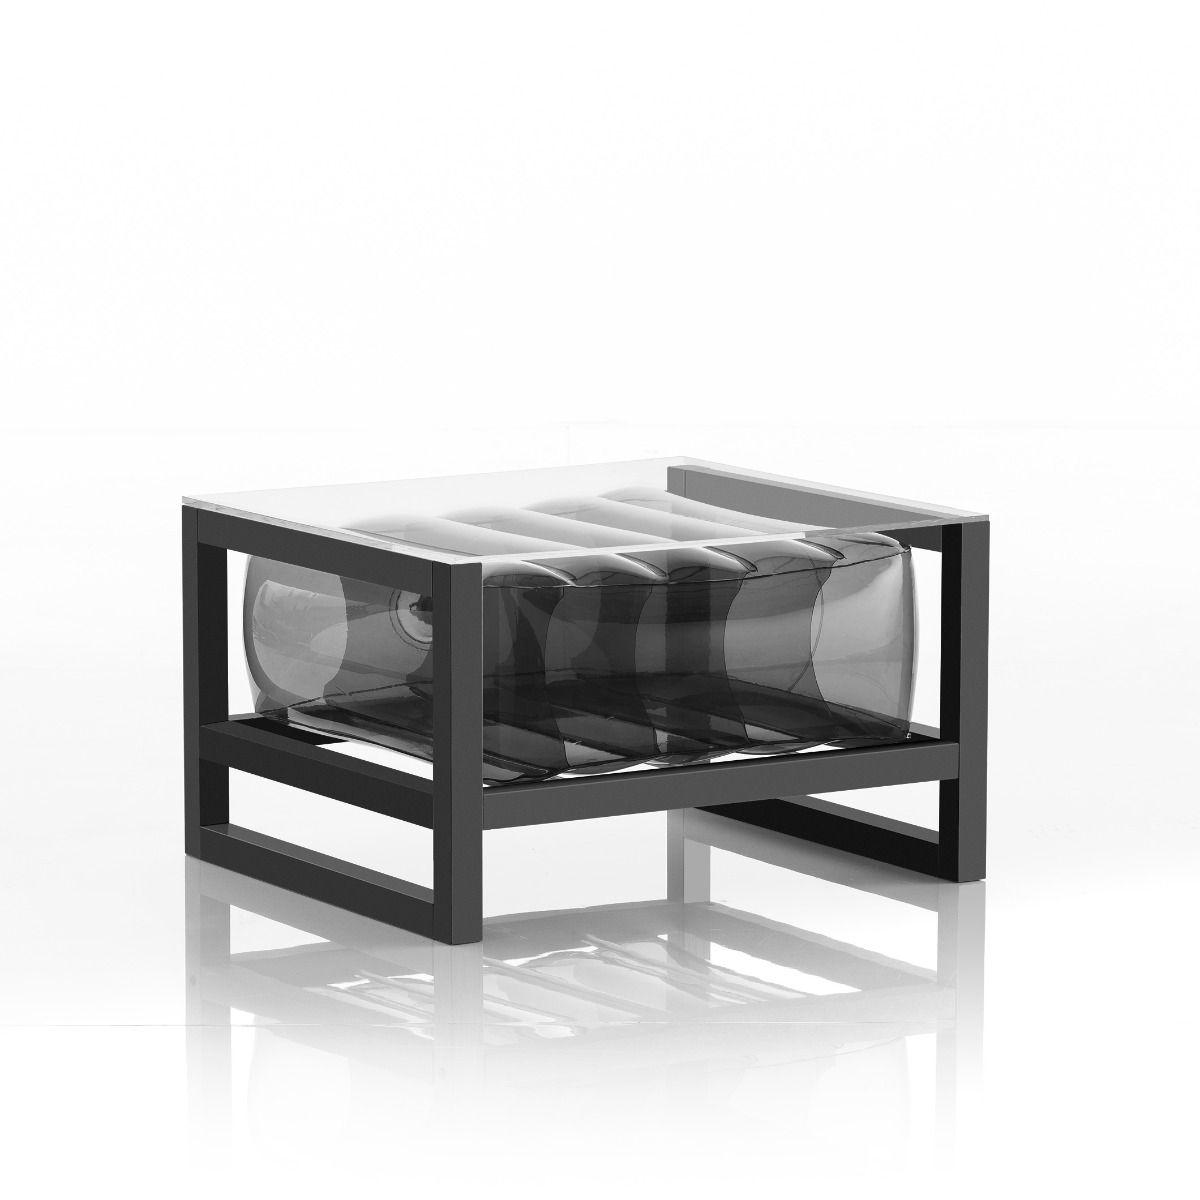 Table basse tpu noir cristal cadre en aluminium